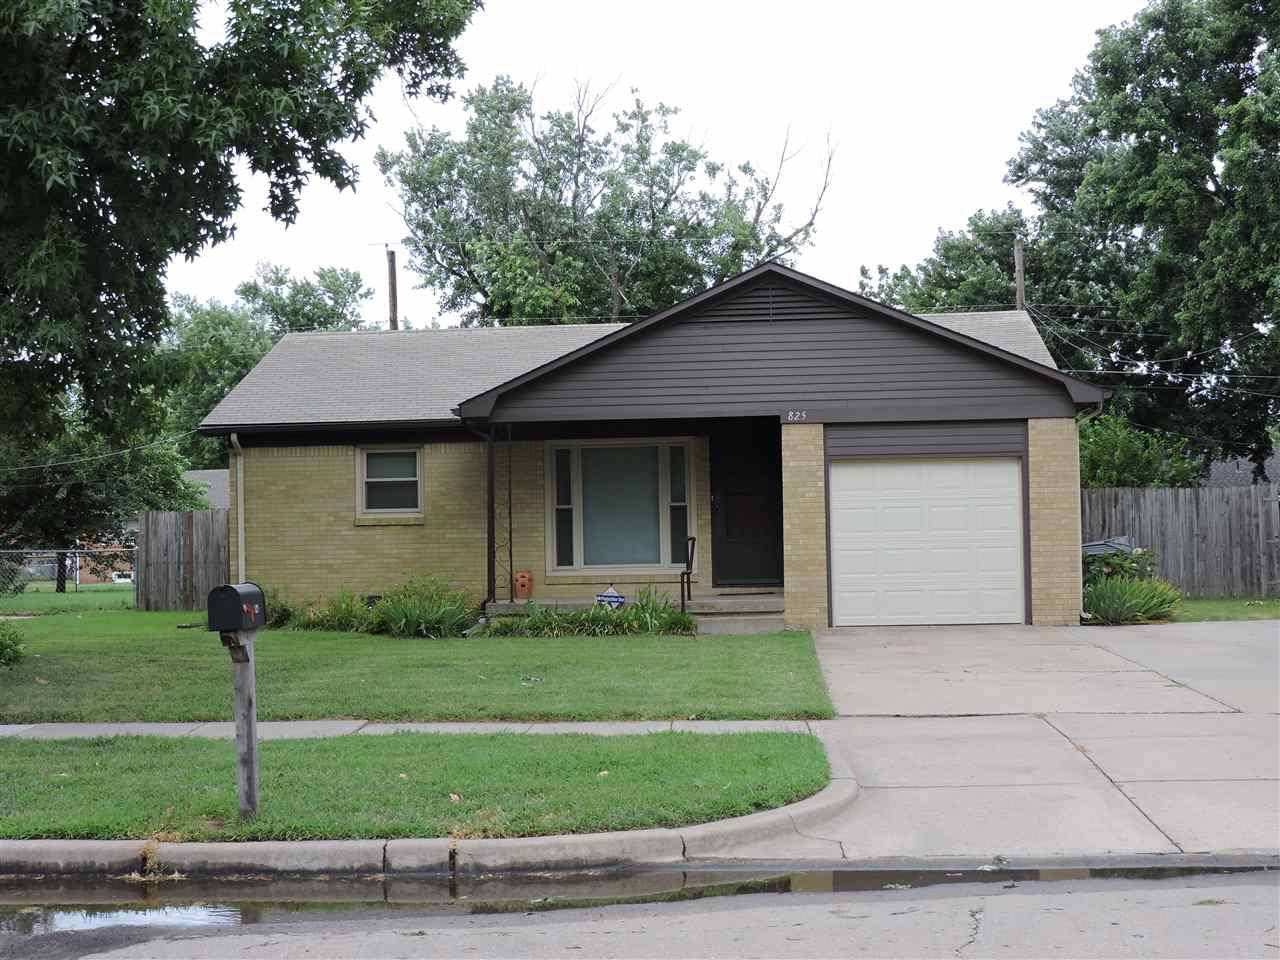 Wichita Ks Homes For Sale 95 000 To 100 000